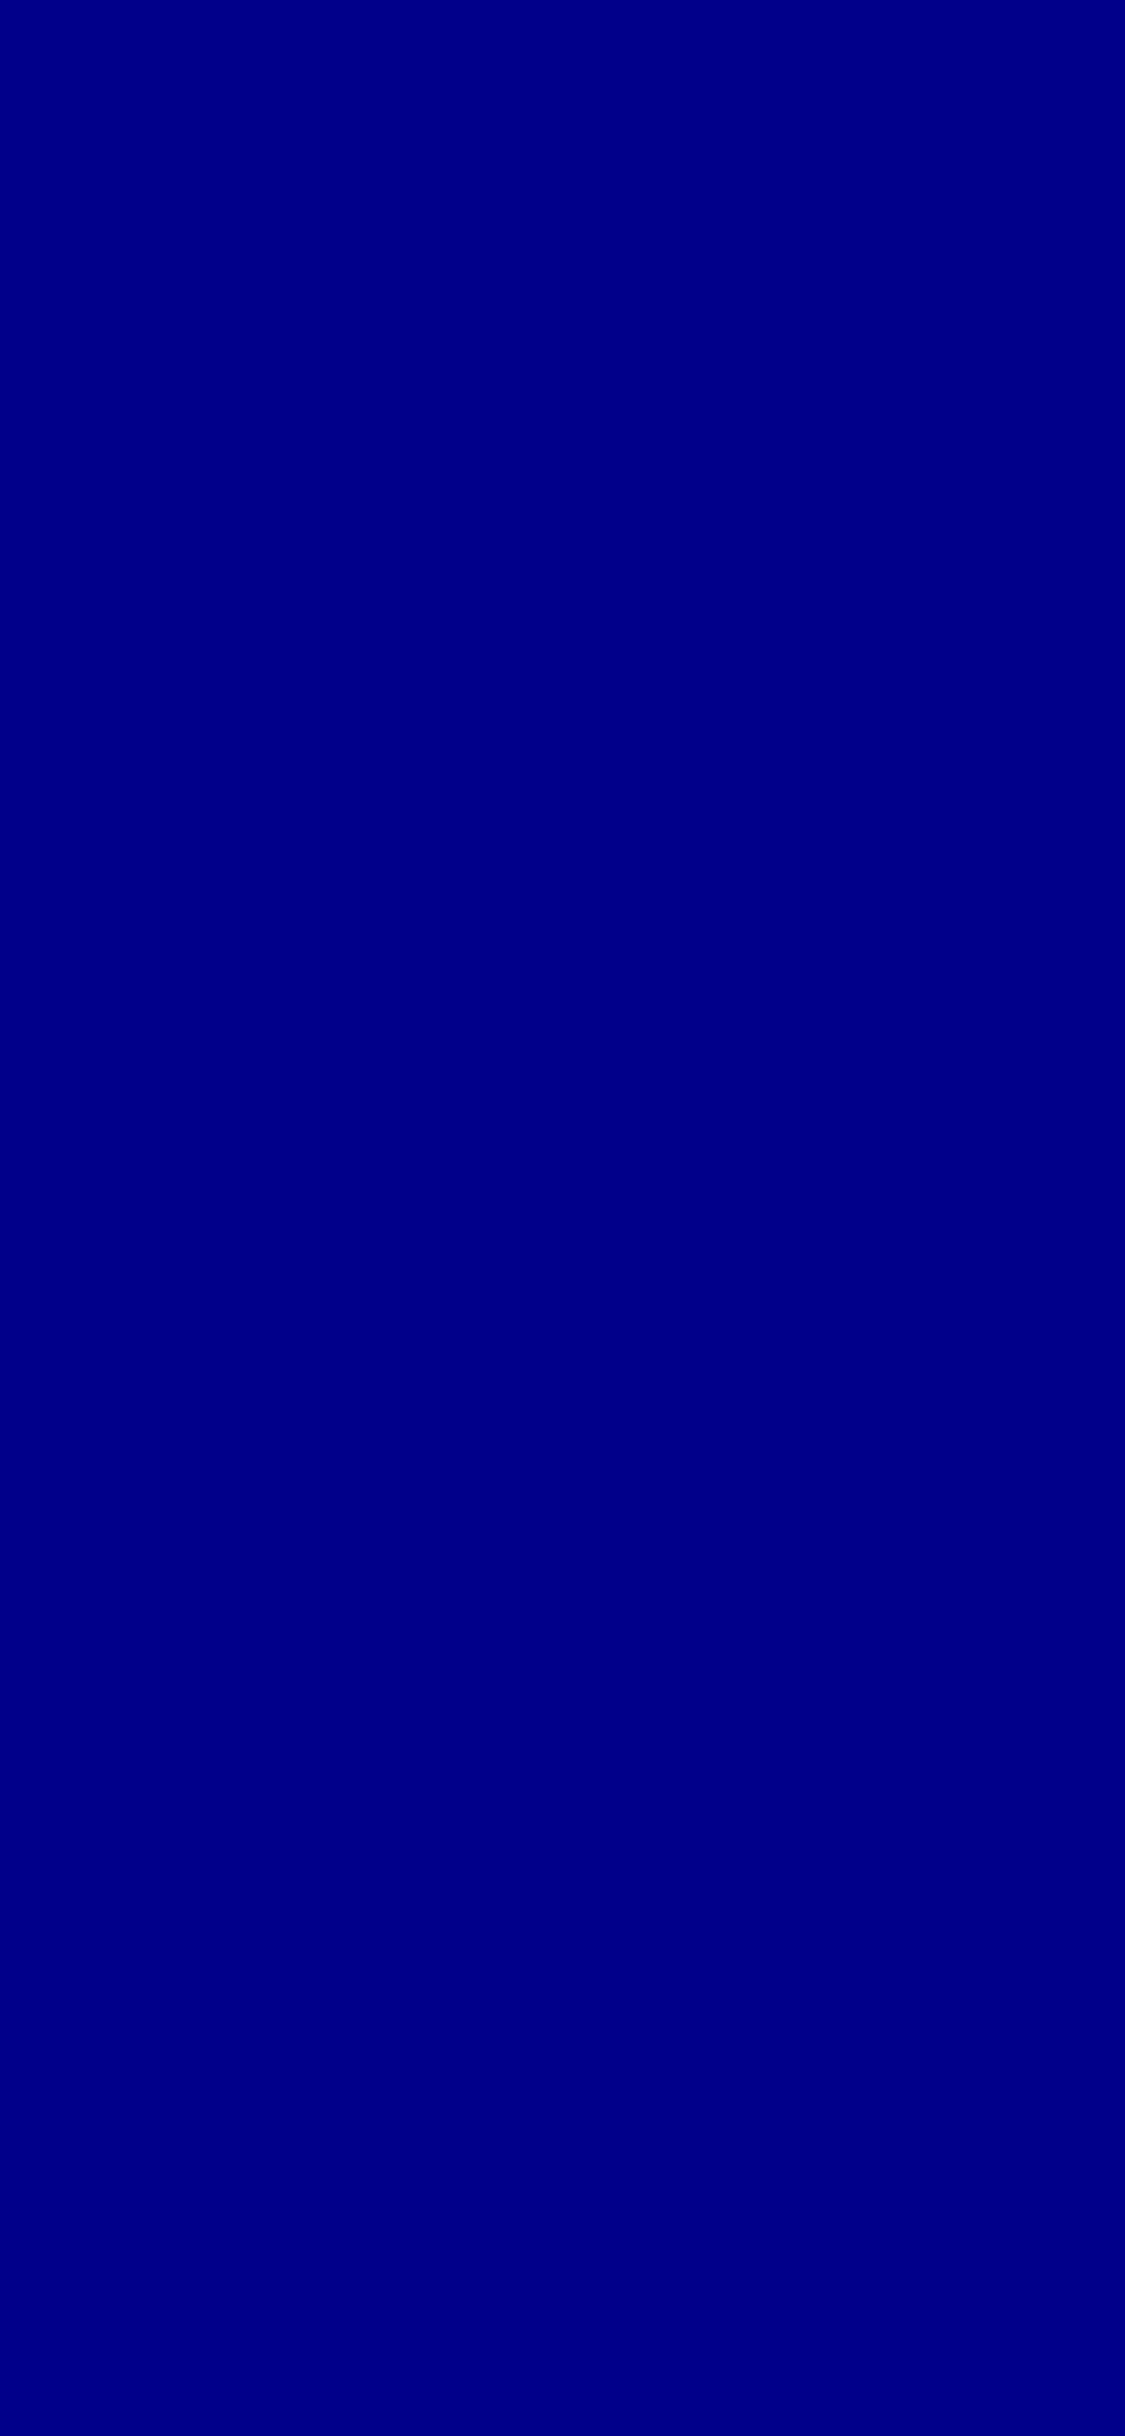 1125x2436 Dark Blue Solid Color Background